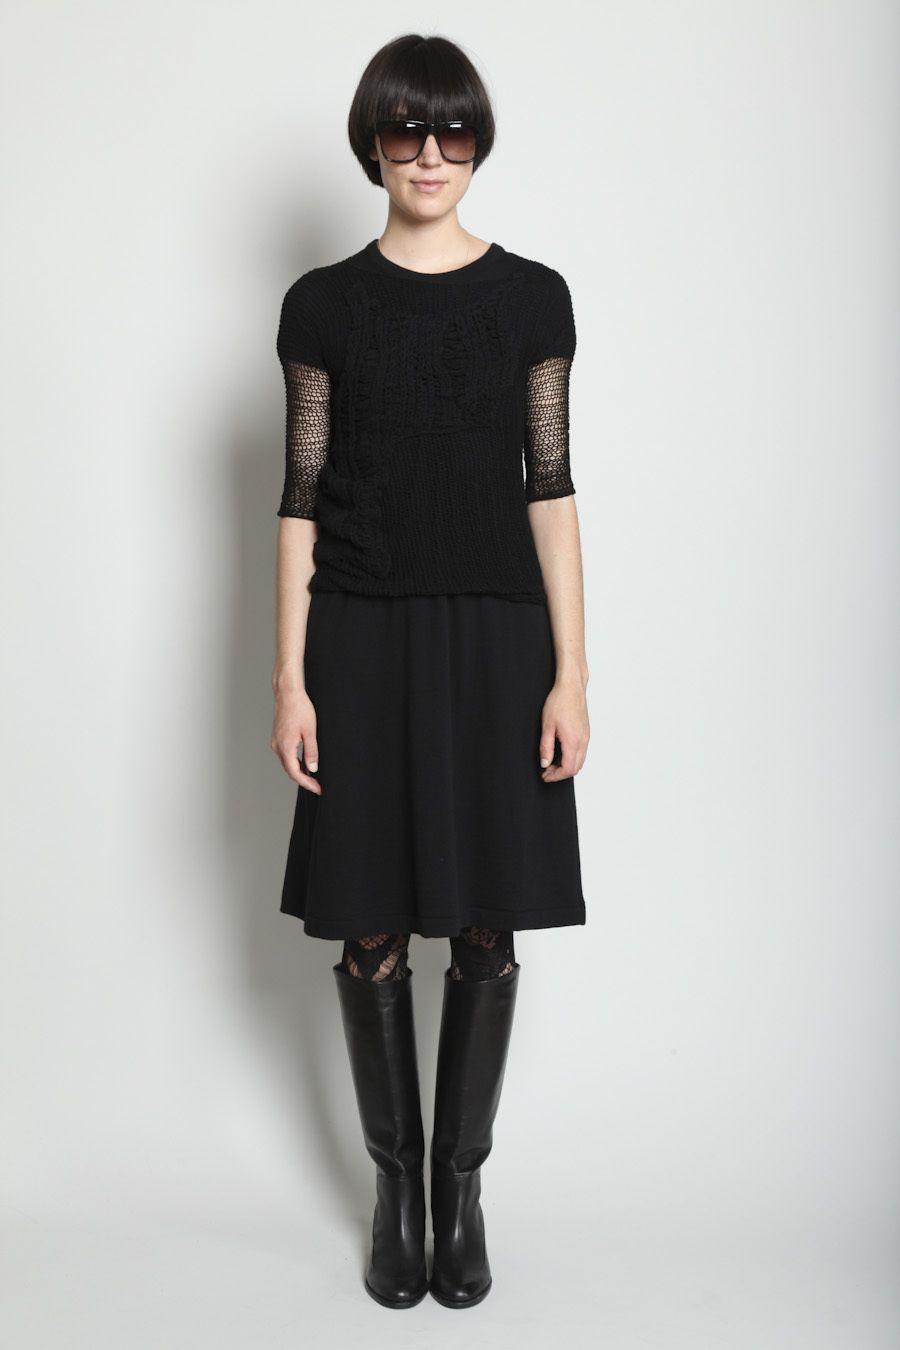 Totokaelo - Yohji Yamamoto Black Attach Knit